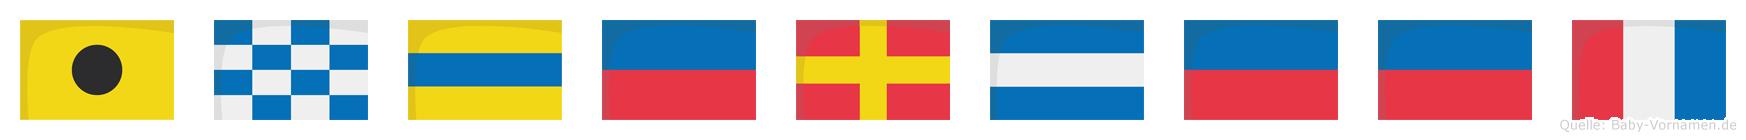 Inderjeet im Flaggenalphabet